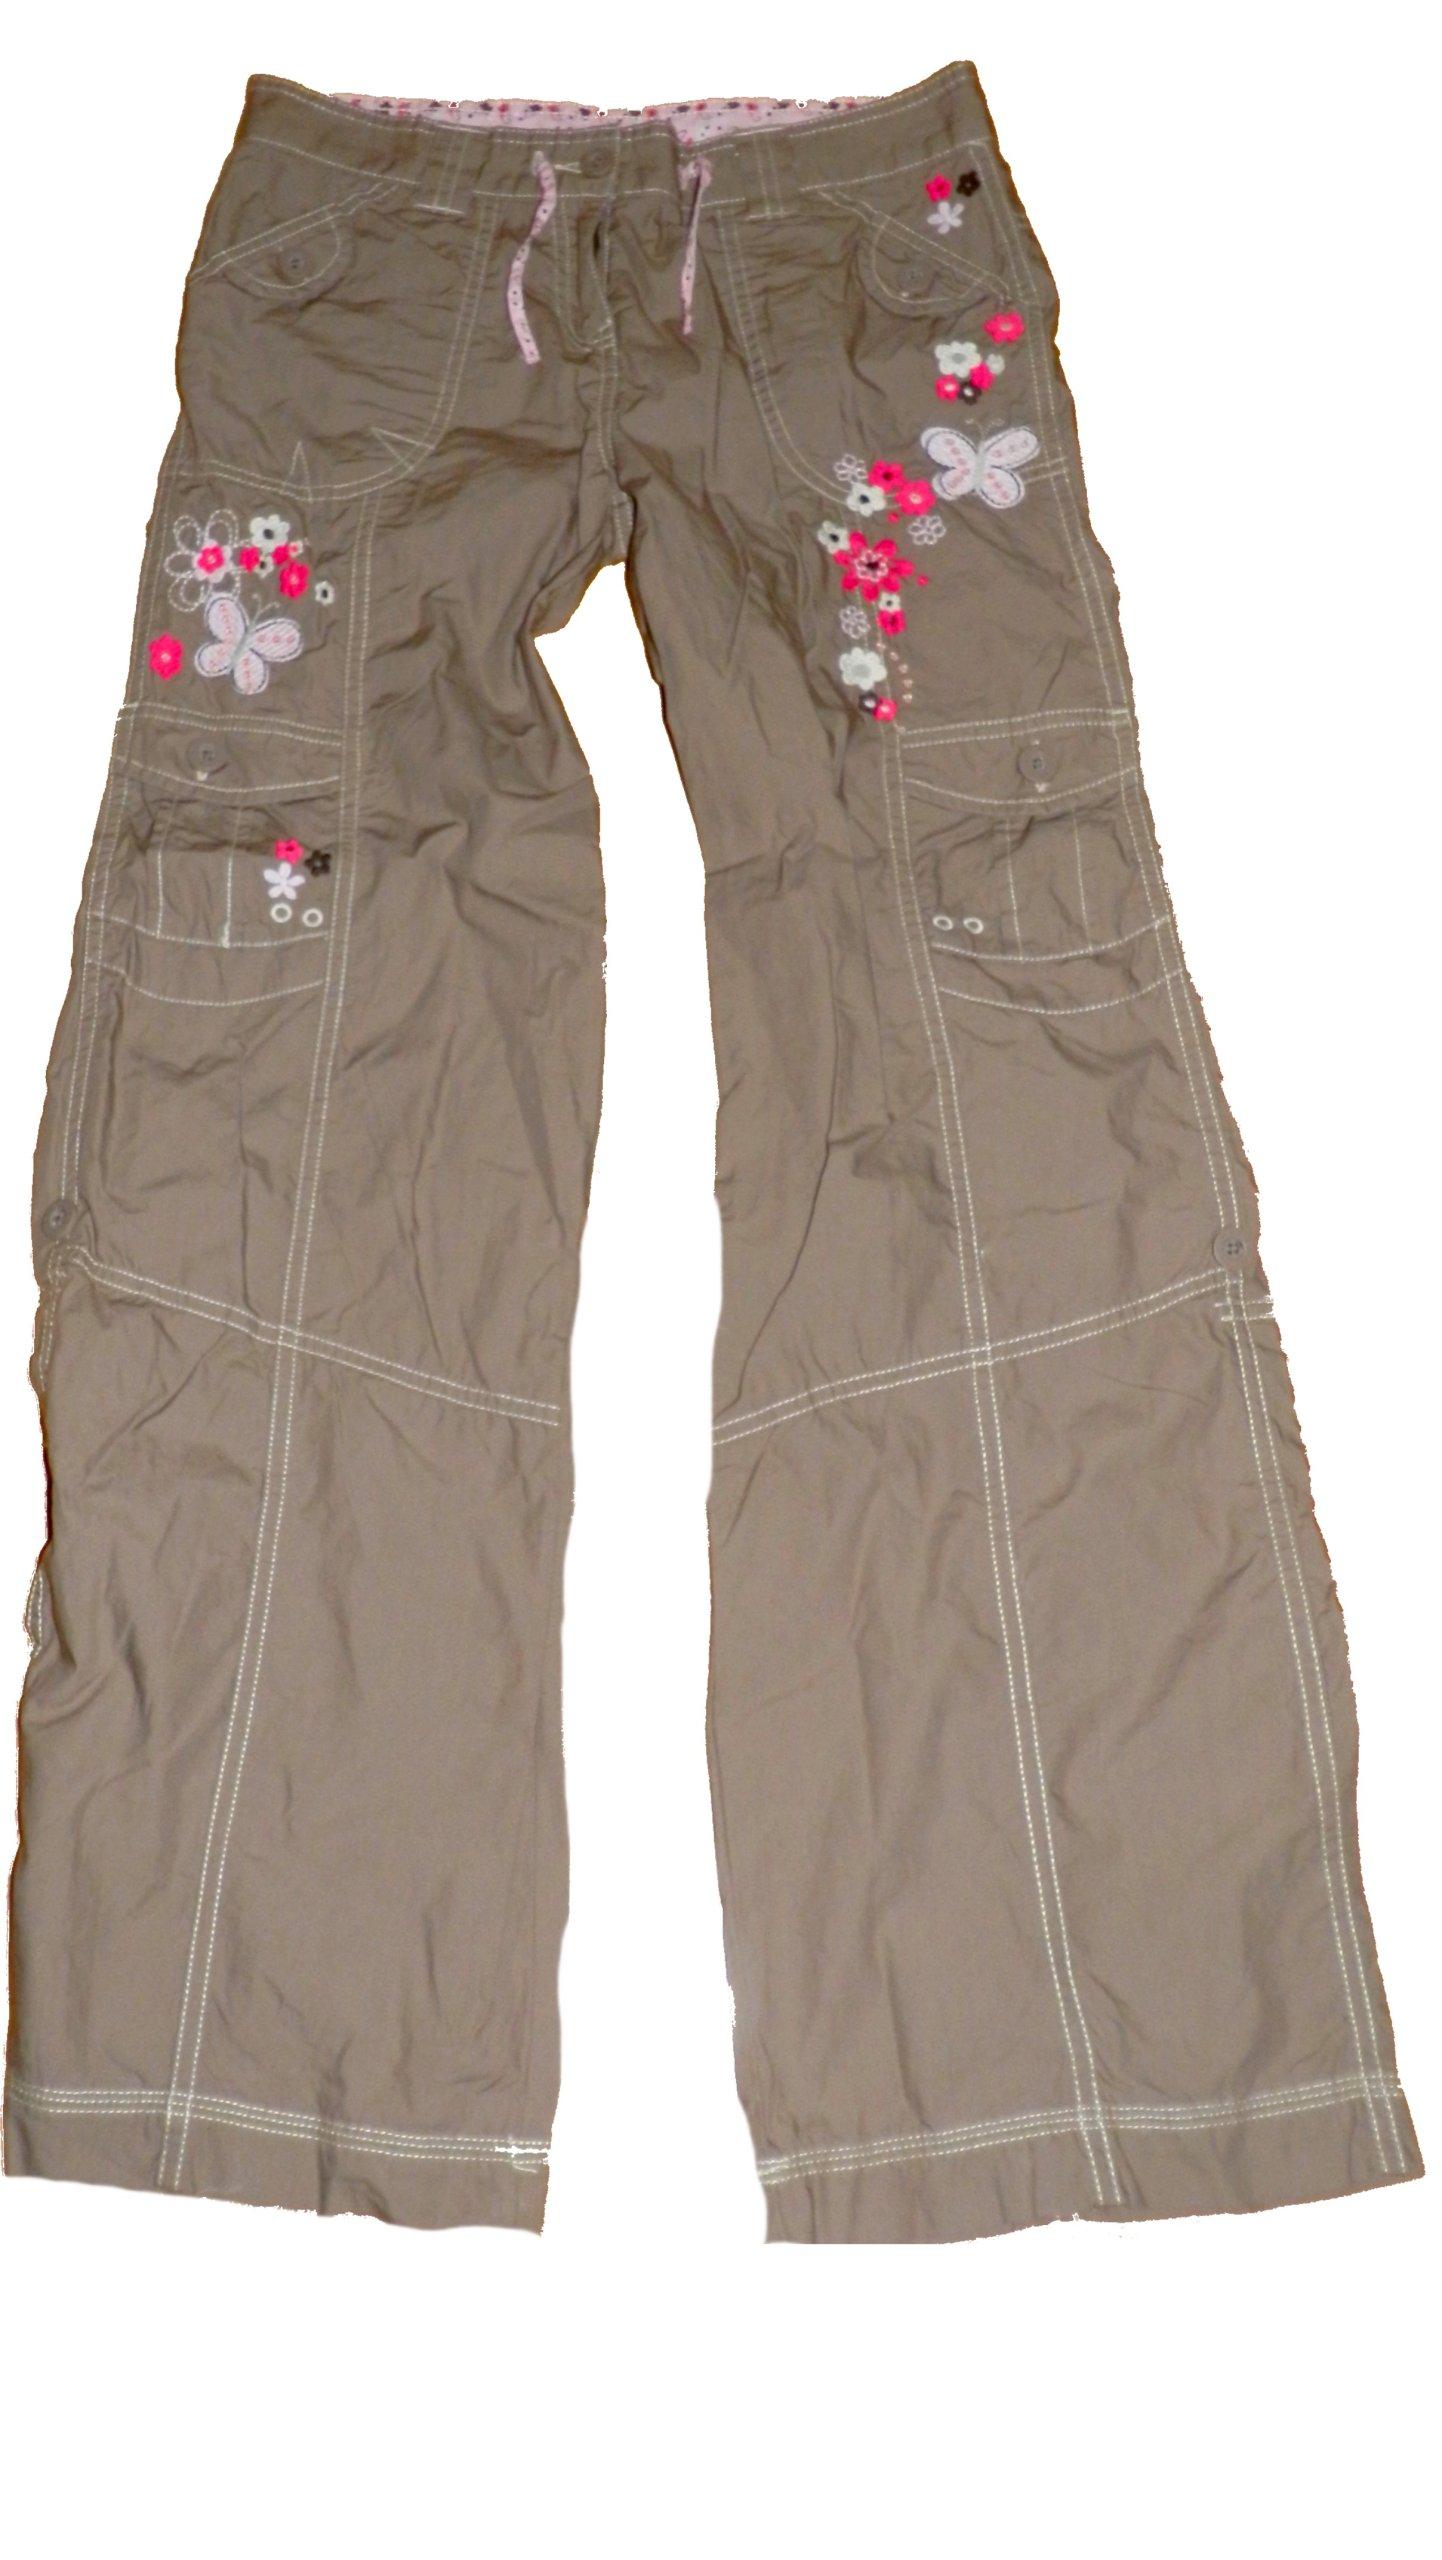 Cherokee spodnie z haftem/ rybaczki 12/13 158/164